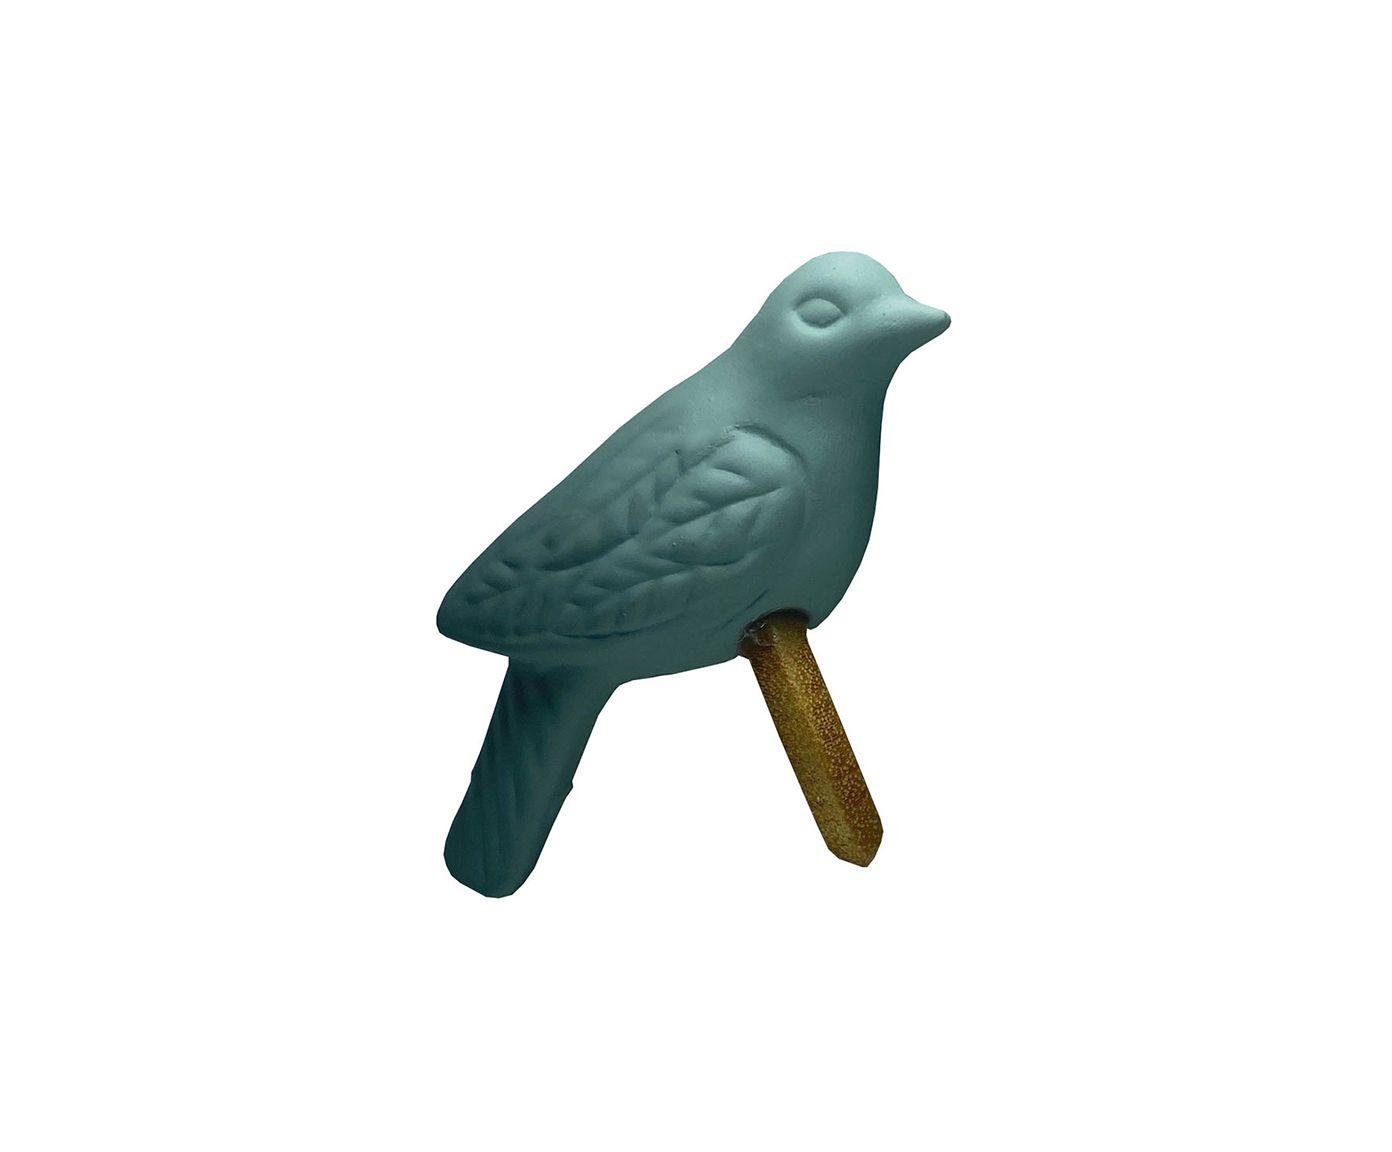 Anel para Guardanapo Pássaro Fosco Verde Claro | Westwing.com.br